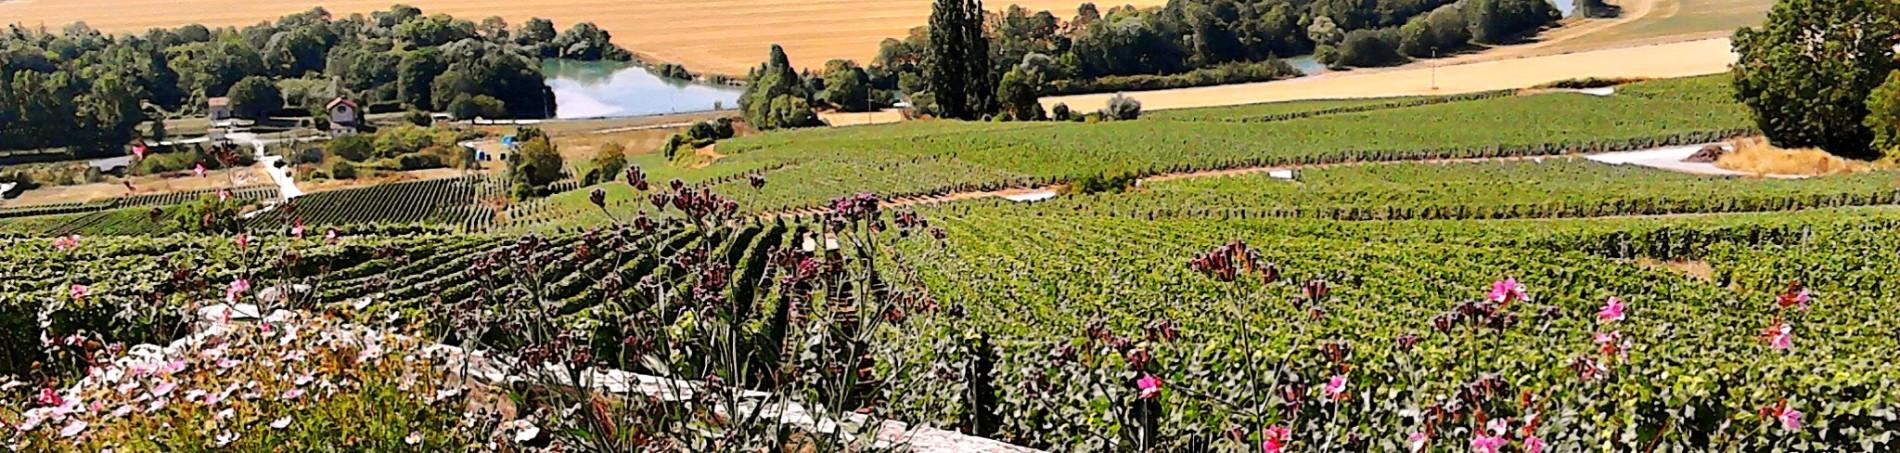 Zicht op de Marne vanuit Chatillon-sur-Marne